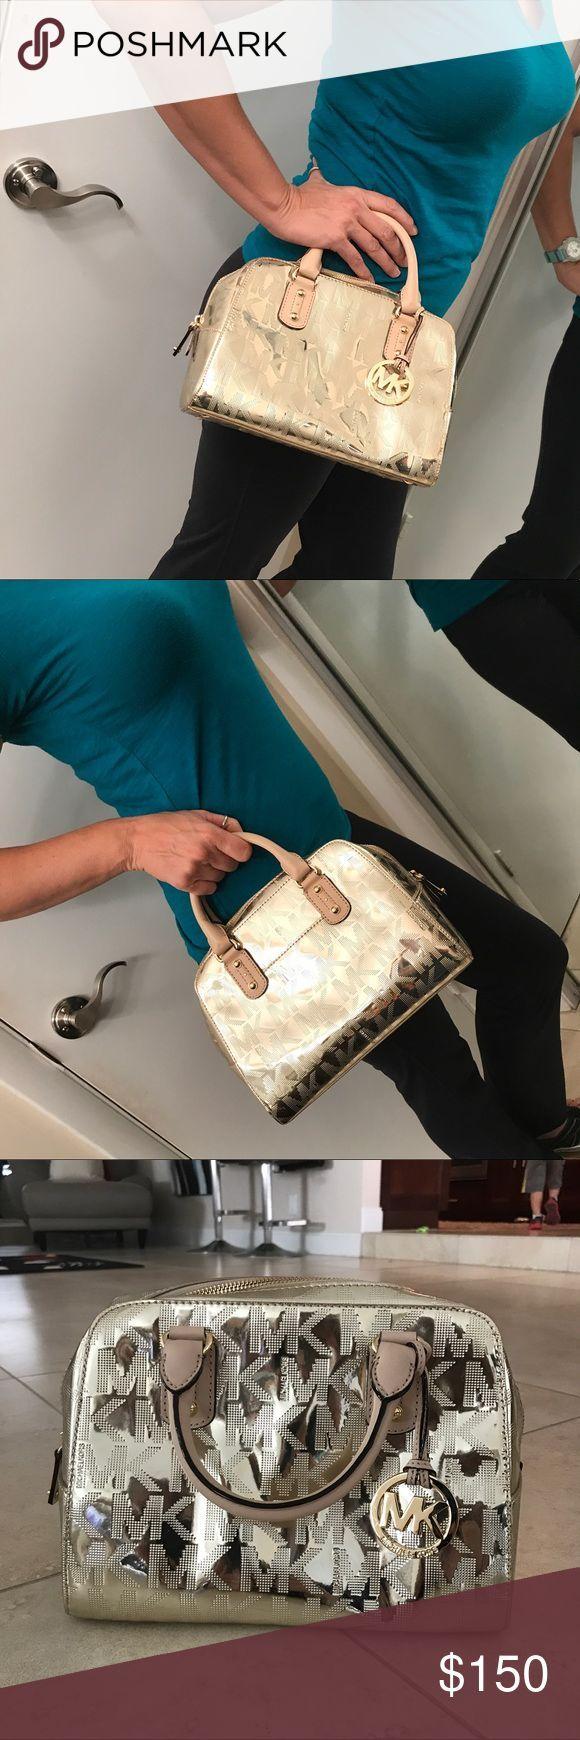 Cool Michael Kors Bags Michael kors gold purse satchel handbag Harder to find signature small mirror go... Check more at http://24myshop.ga/fashion/michael-kors-bags-michael-kors-gold-purse-satchel-handbag-harder-to-find-signature-small-mirror-go/